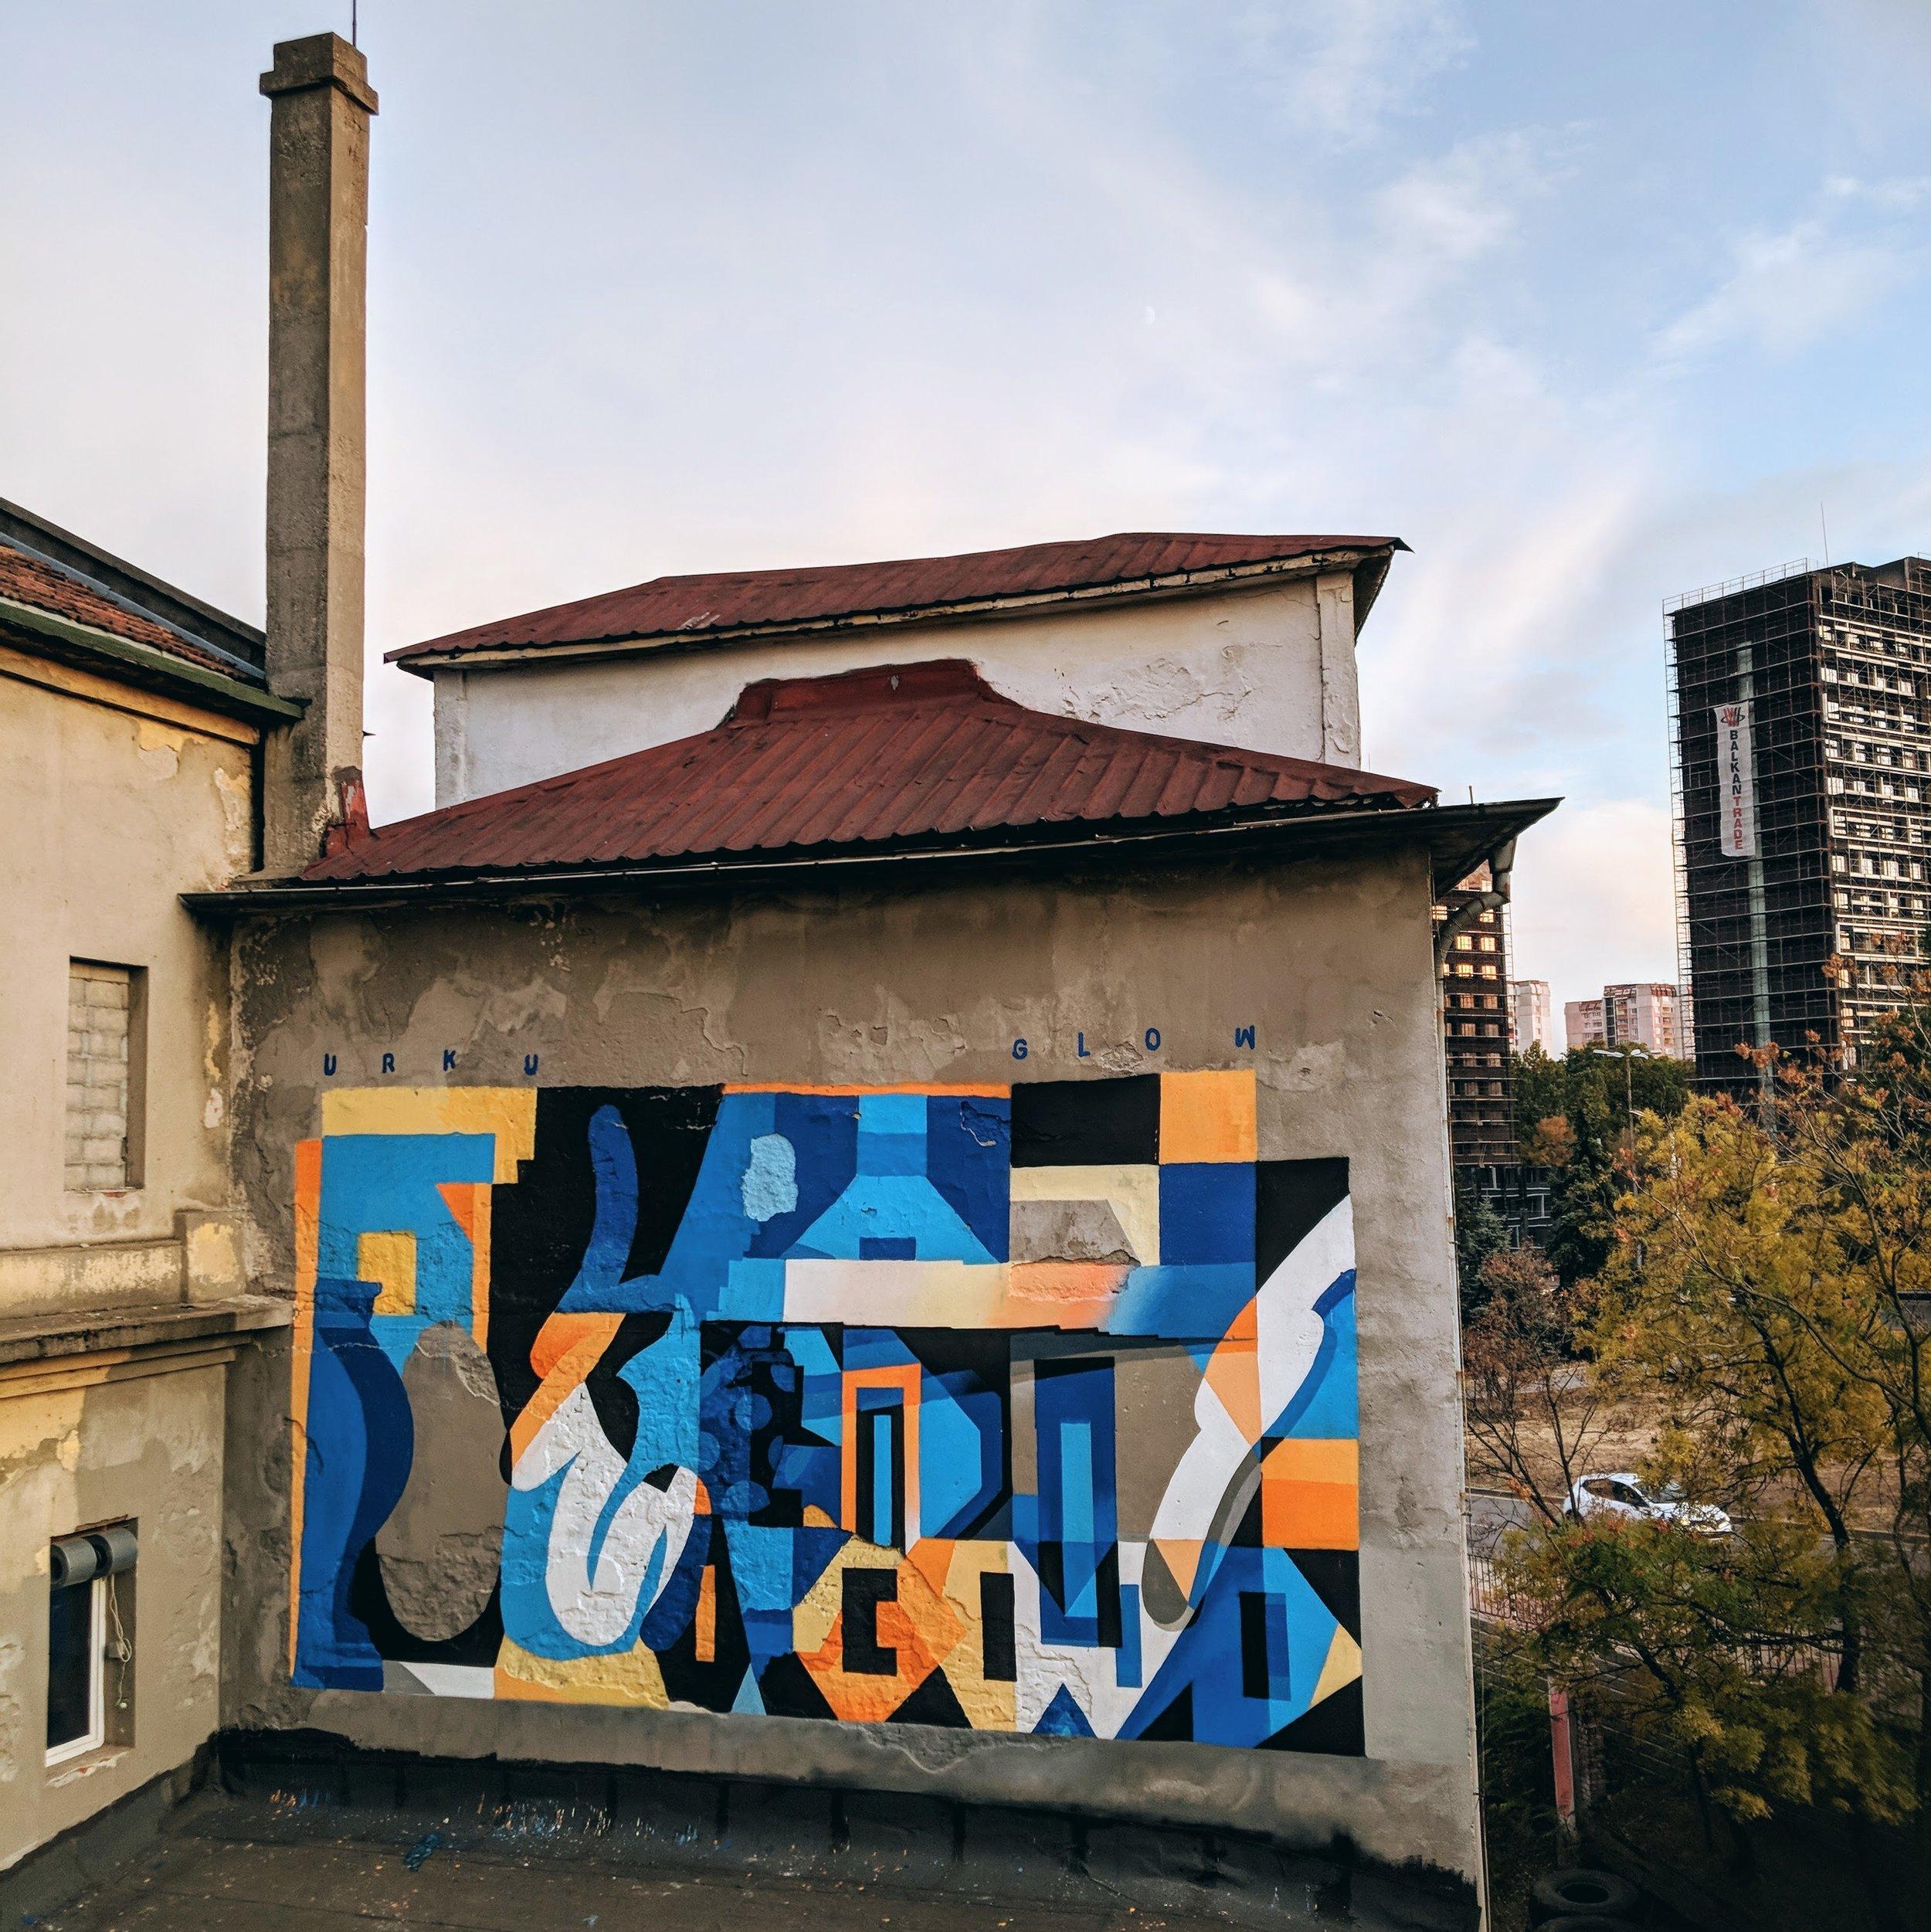 Sofia - Bulgaria - 2019